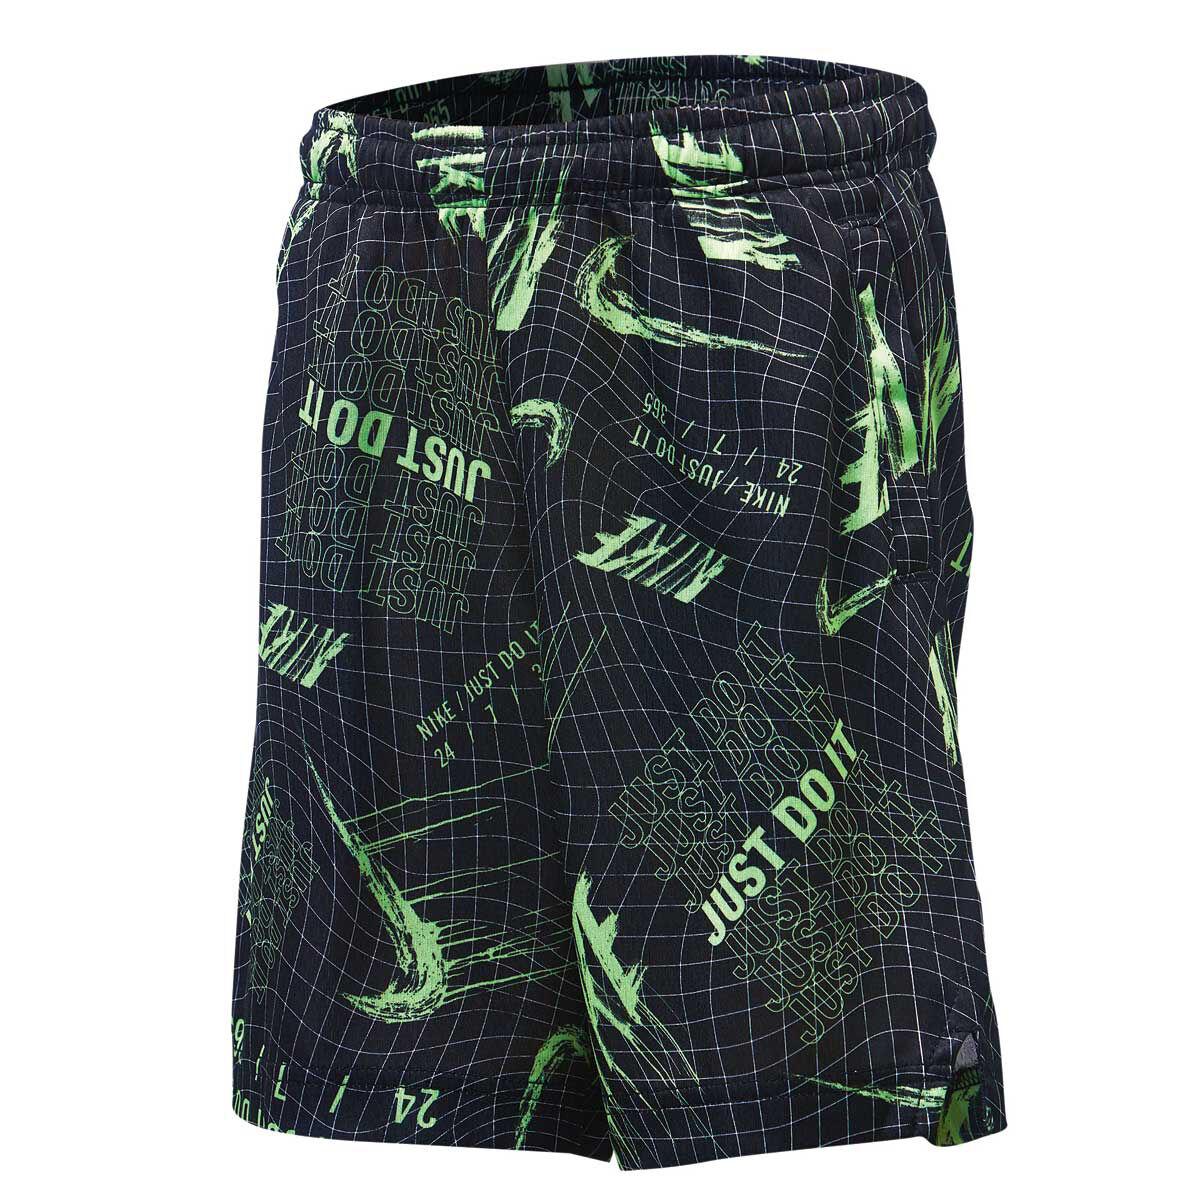 1556f2624421c9 Nike boys all over print drifit basketball shorts black green black green  jpg 233x233 Pink green